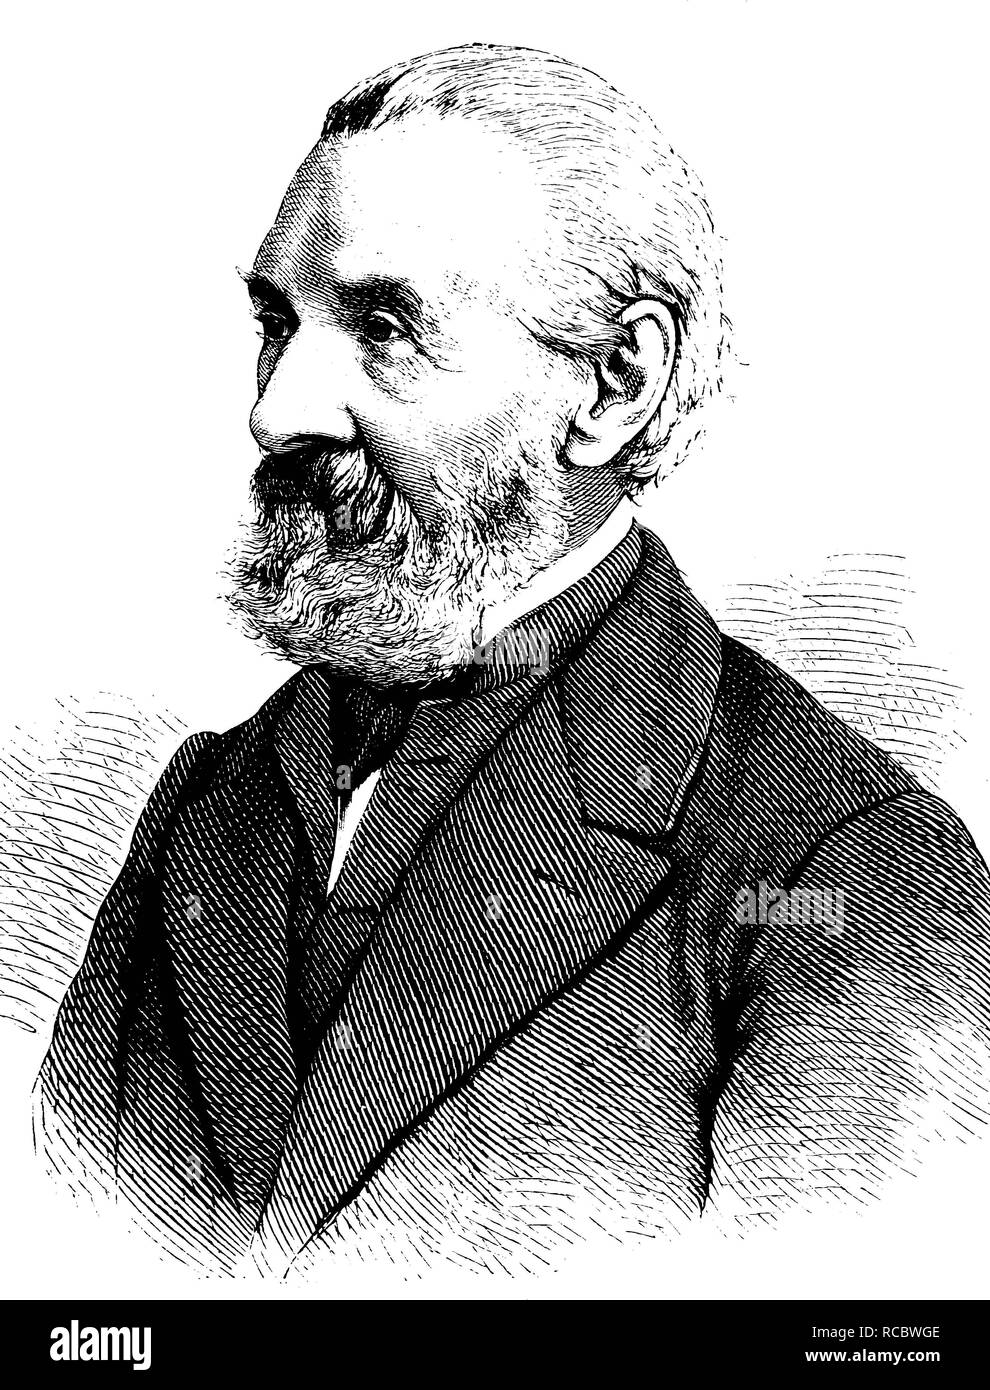 Ernst Heinrich Carl von Dechen, 1800 - 1899, un professore di ingegneria mineraria e inventore, storica incisione, circa 1889 Immagini Stock